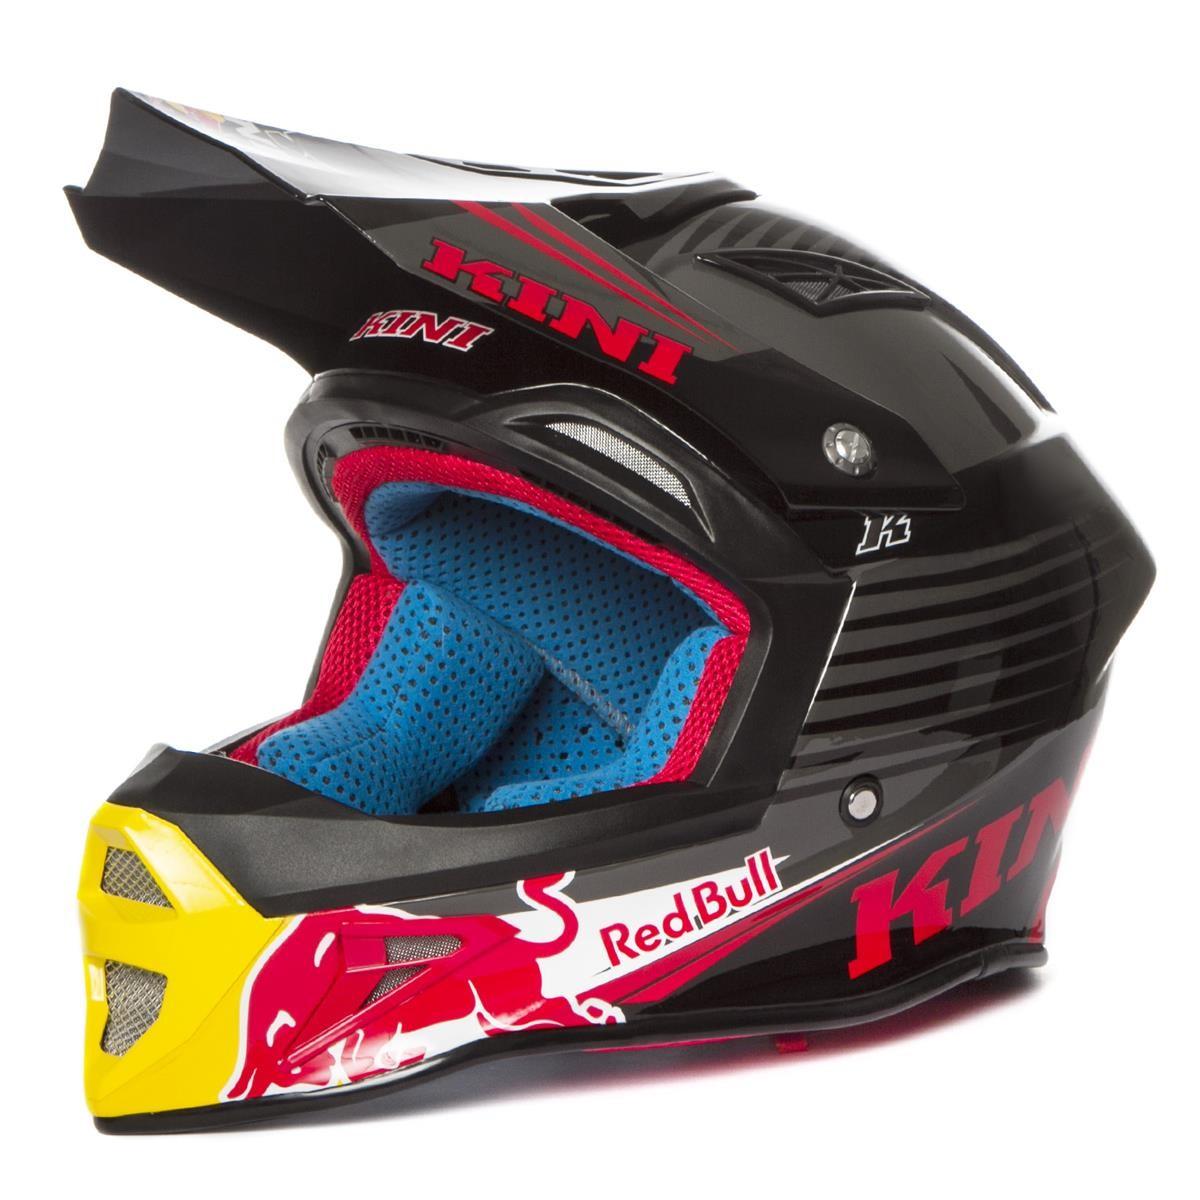 kini red bull casco taglia l mx motocross enduro quad. Black Bedroom Furniture Sets. Home Design Ideas